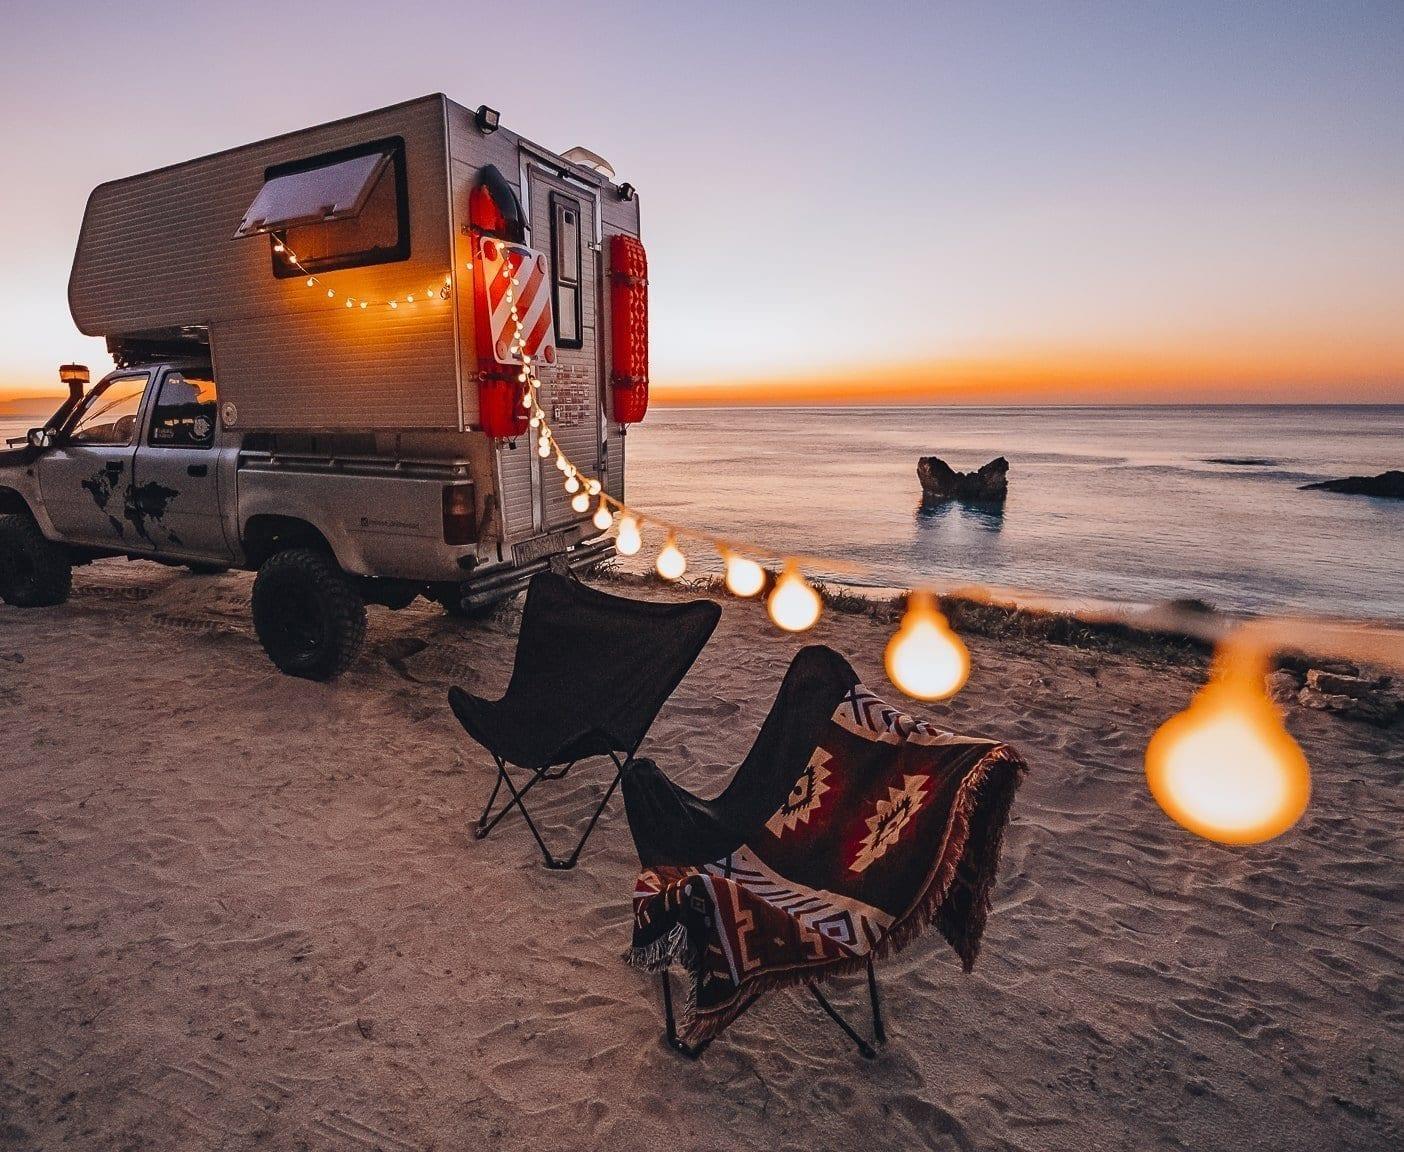 toyota-hilux-ln-105-camper-pickup-vanlife-kaufen-ausbau-2